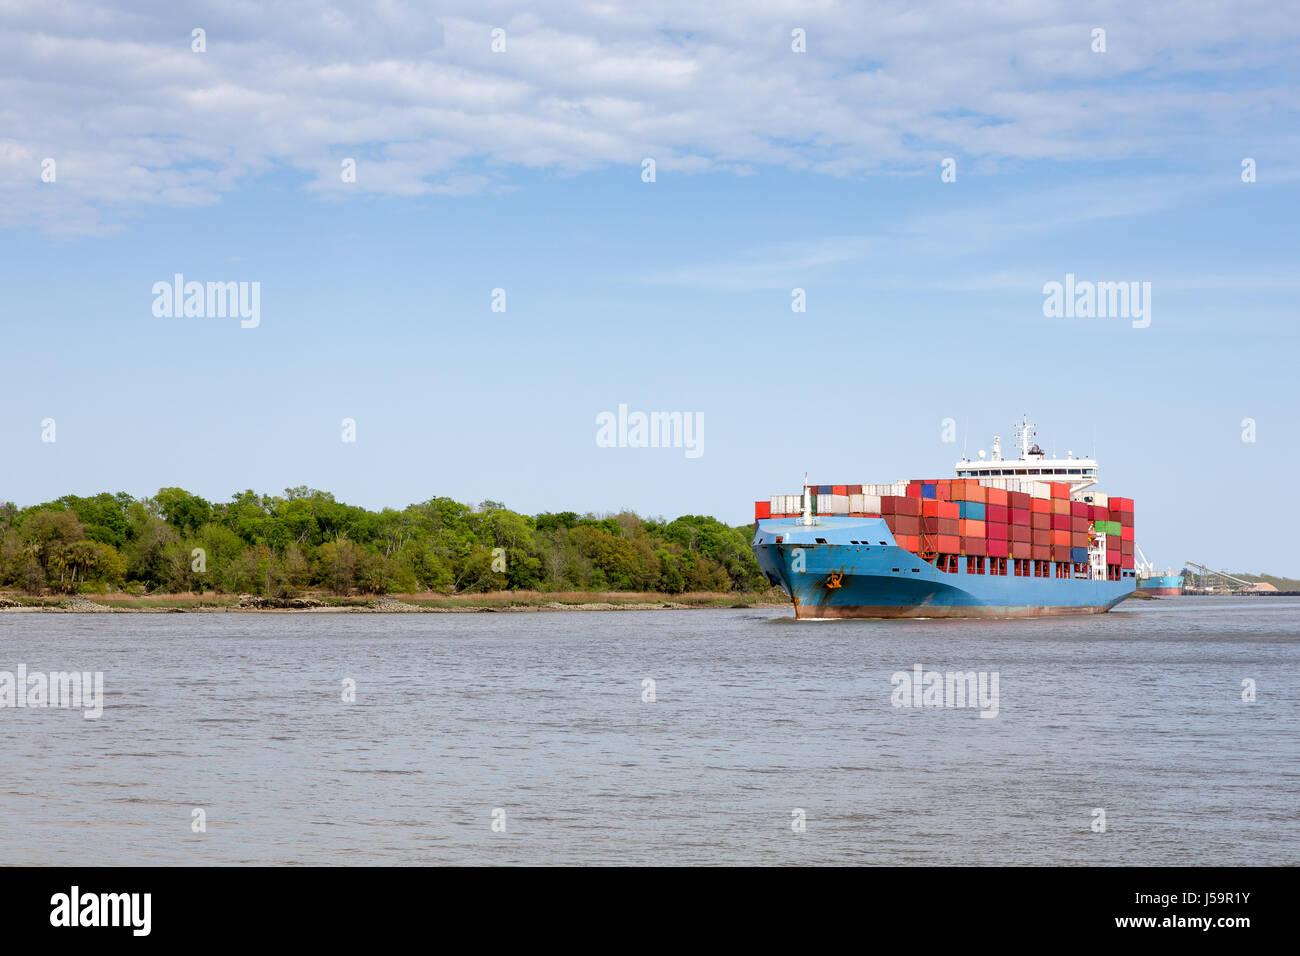 Savannah Port Stock Photos & Savannah Port Stock Images - Alamy